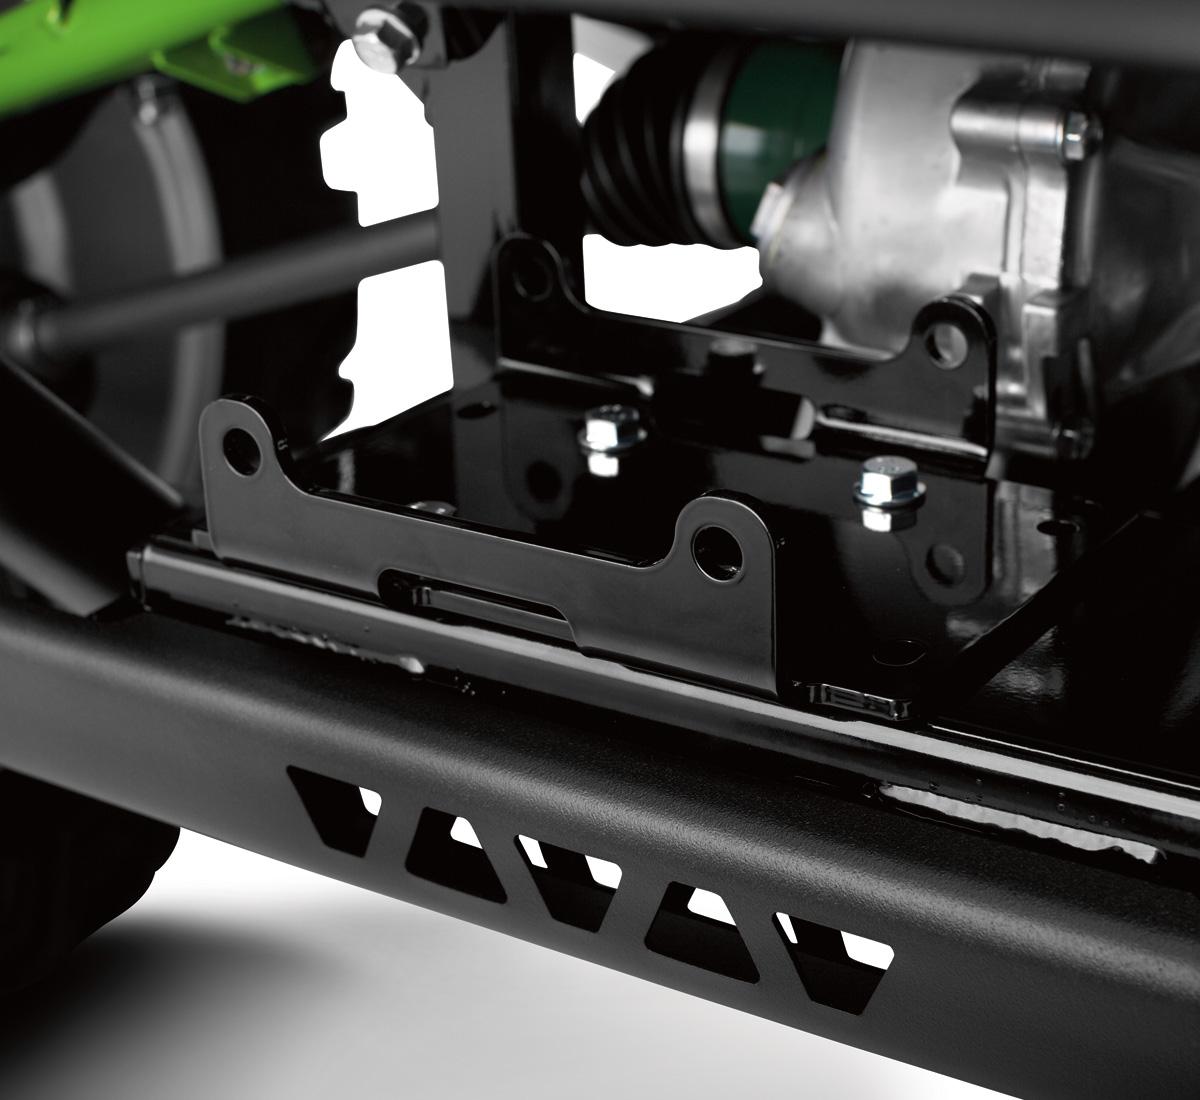 2019 Teryx Le Side X By Kawasaki 2014 Wiring Diagram Winch Mount